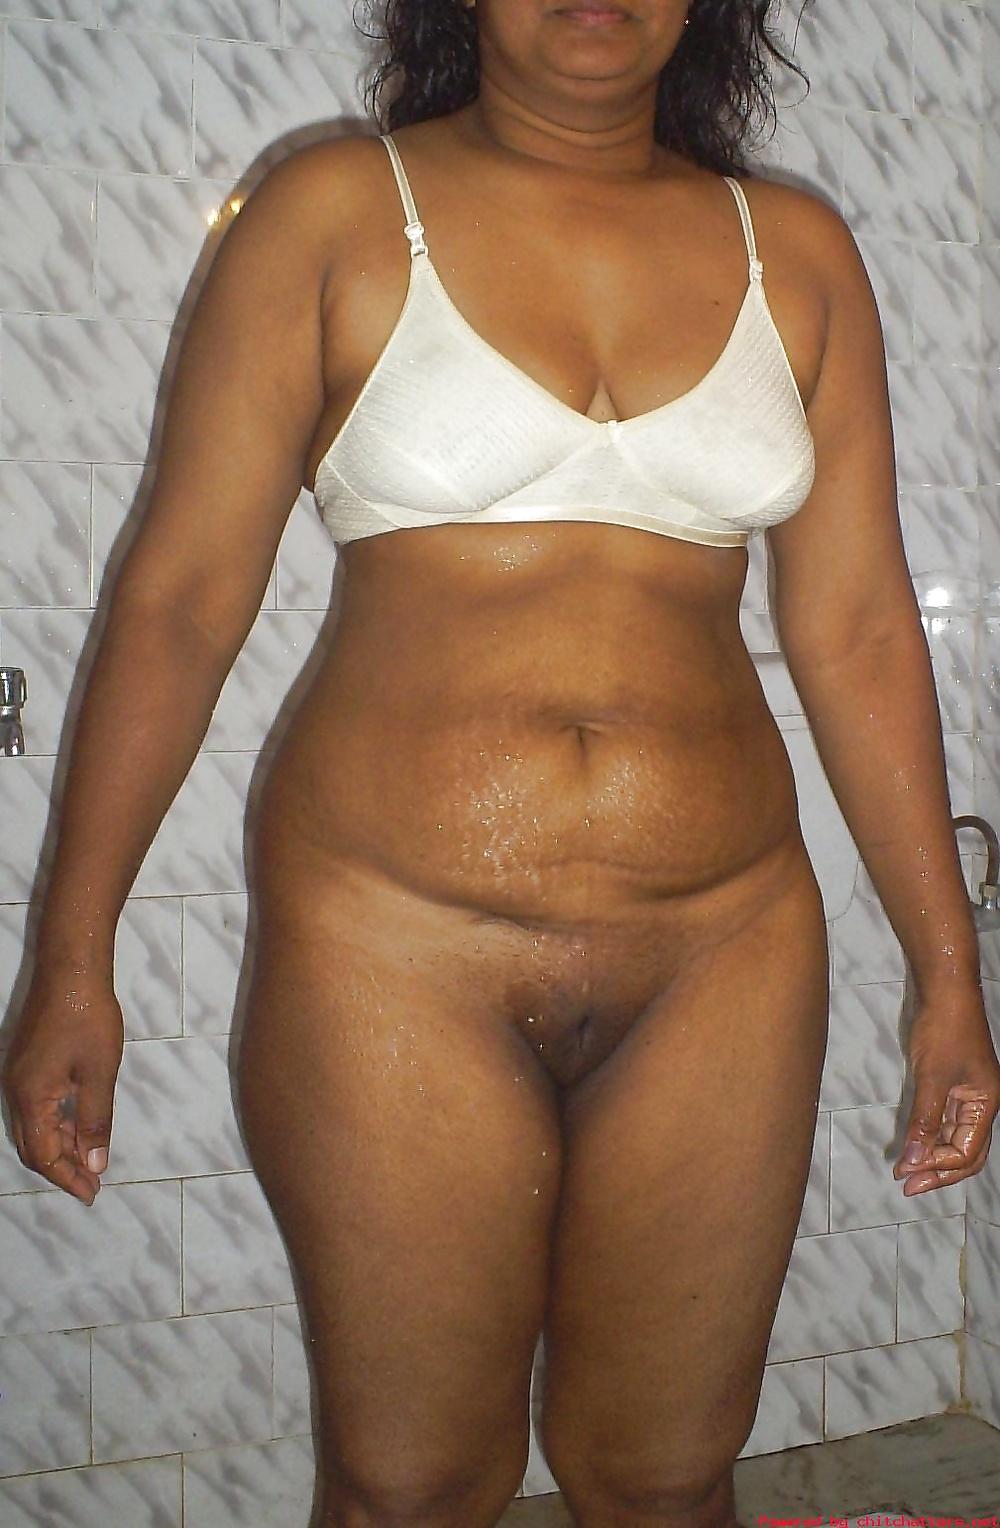 Naked girl for sale